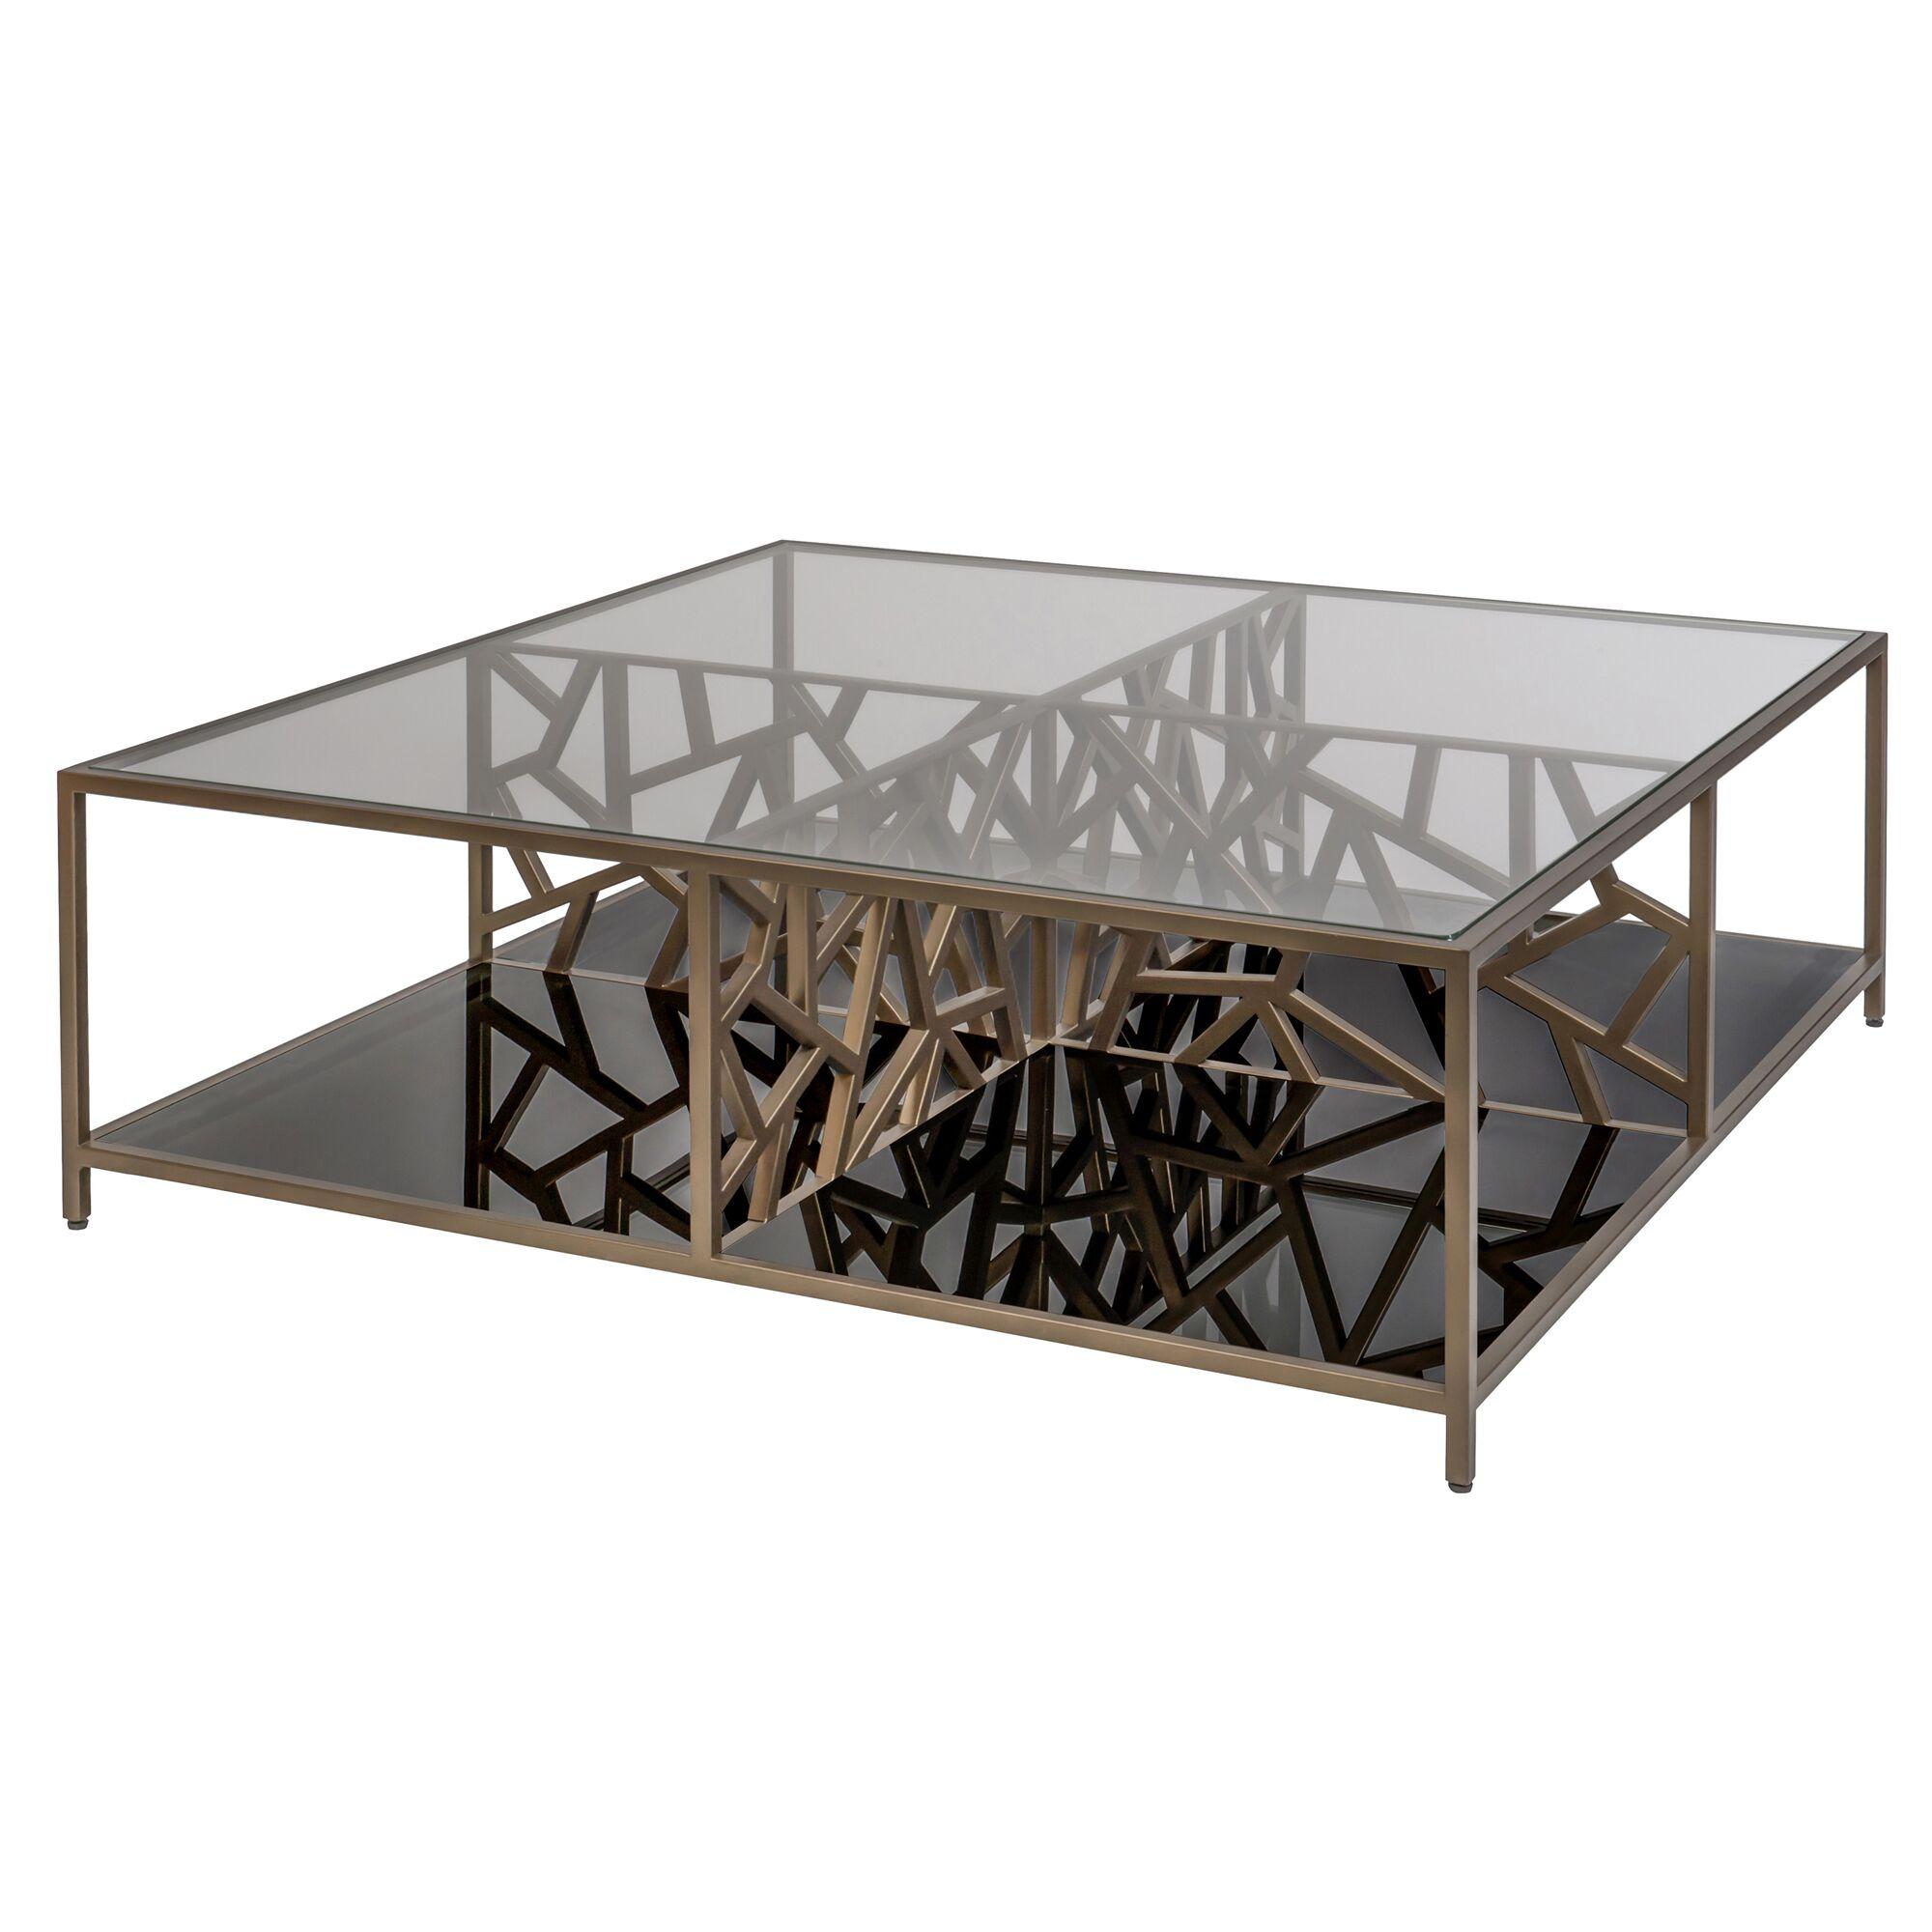 Cracked Ice Coffee Table Color: Gilt Medium Bronze, Bottom Shelf Color: Smokey Grey